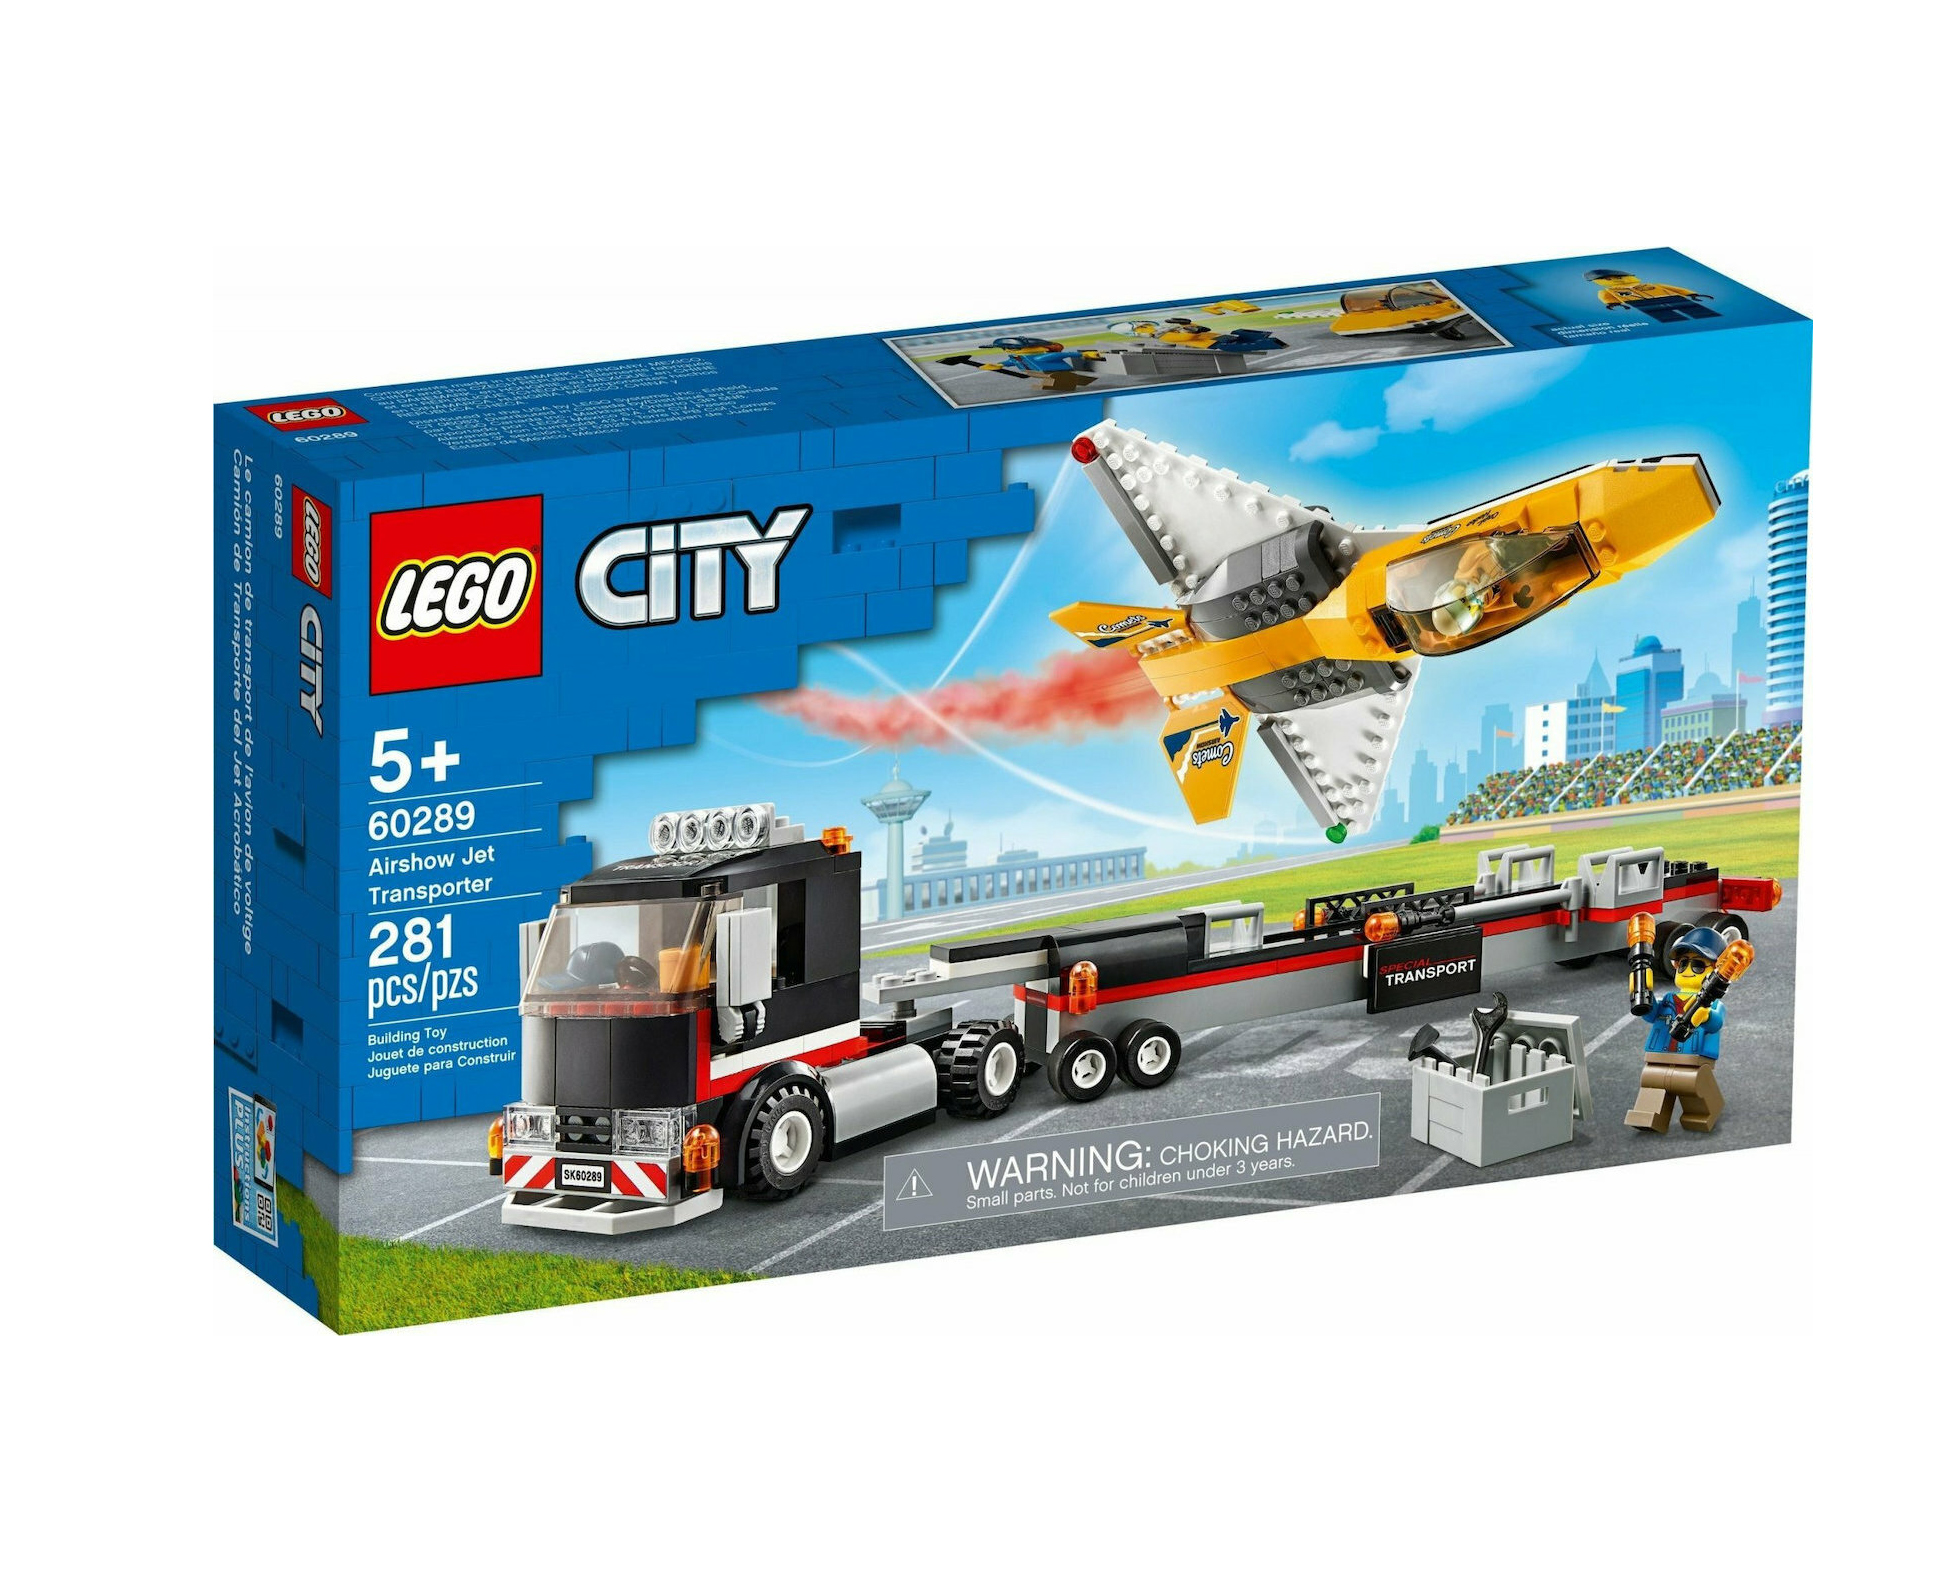 Lego City: Airshow Jet Transporter 60289